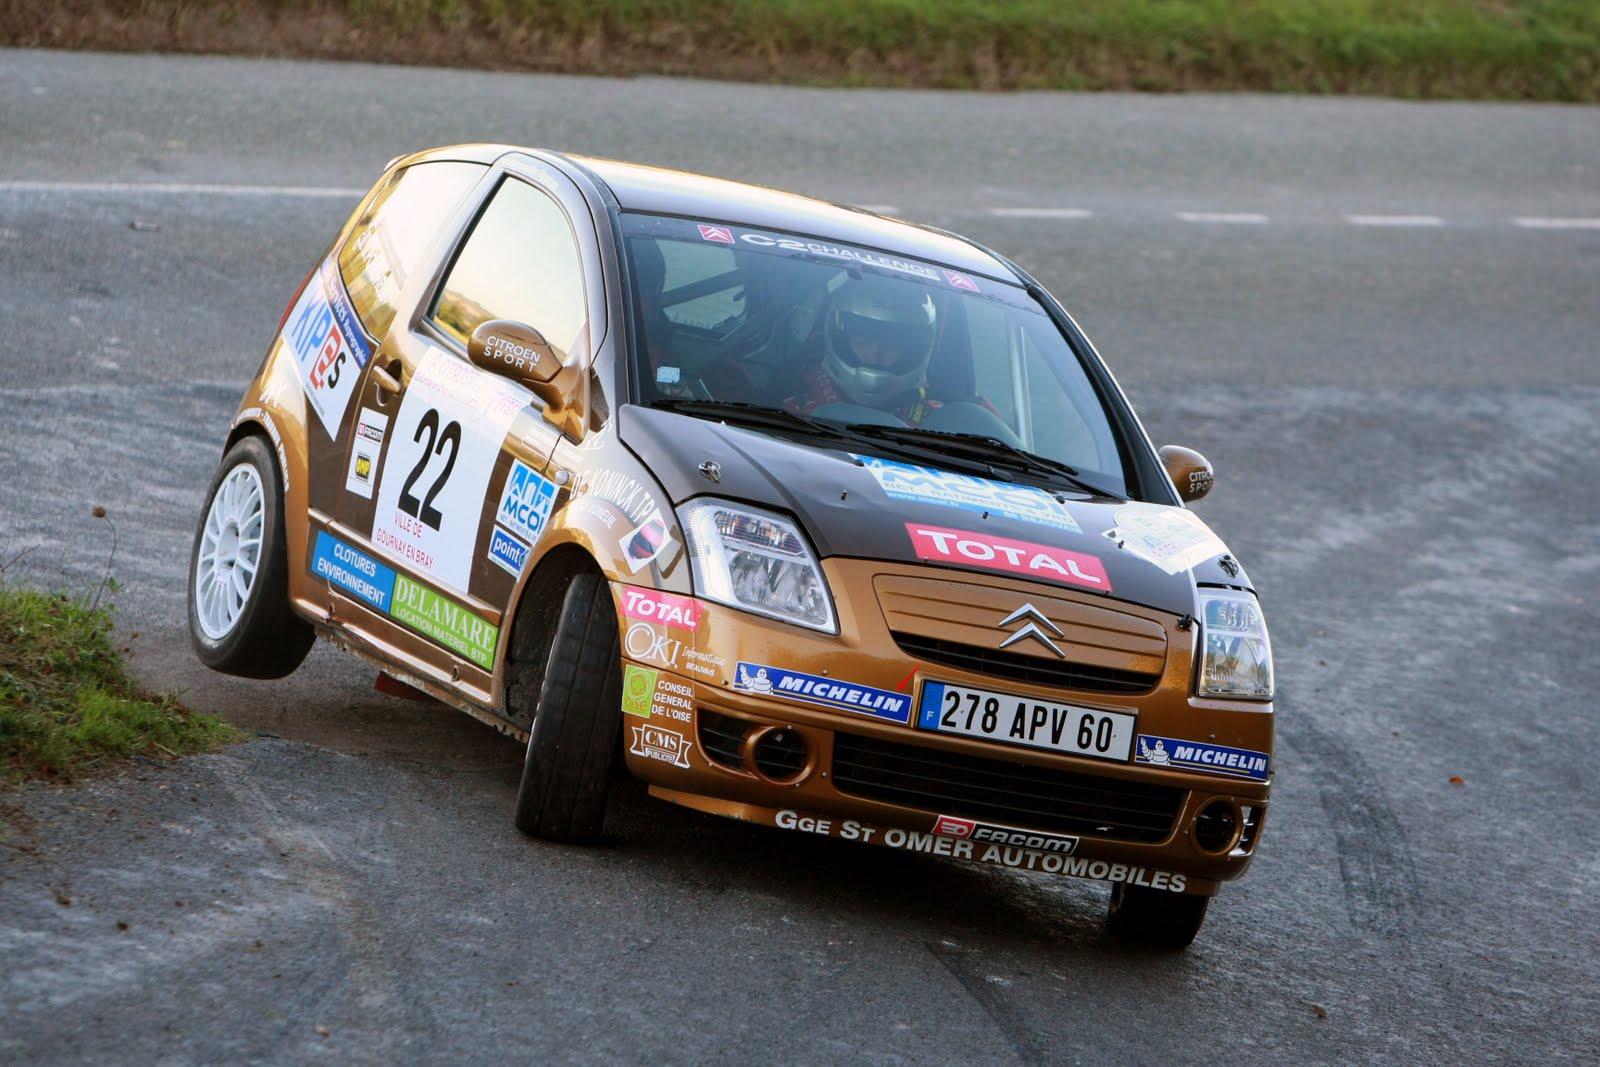 Team g competition classement rallye porte normande 2010 for Porte normande